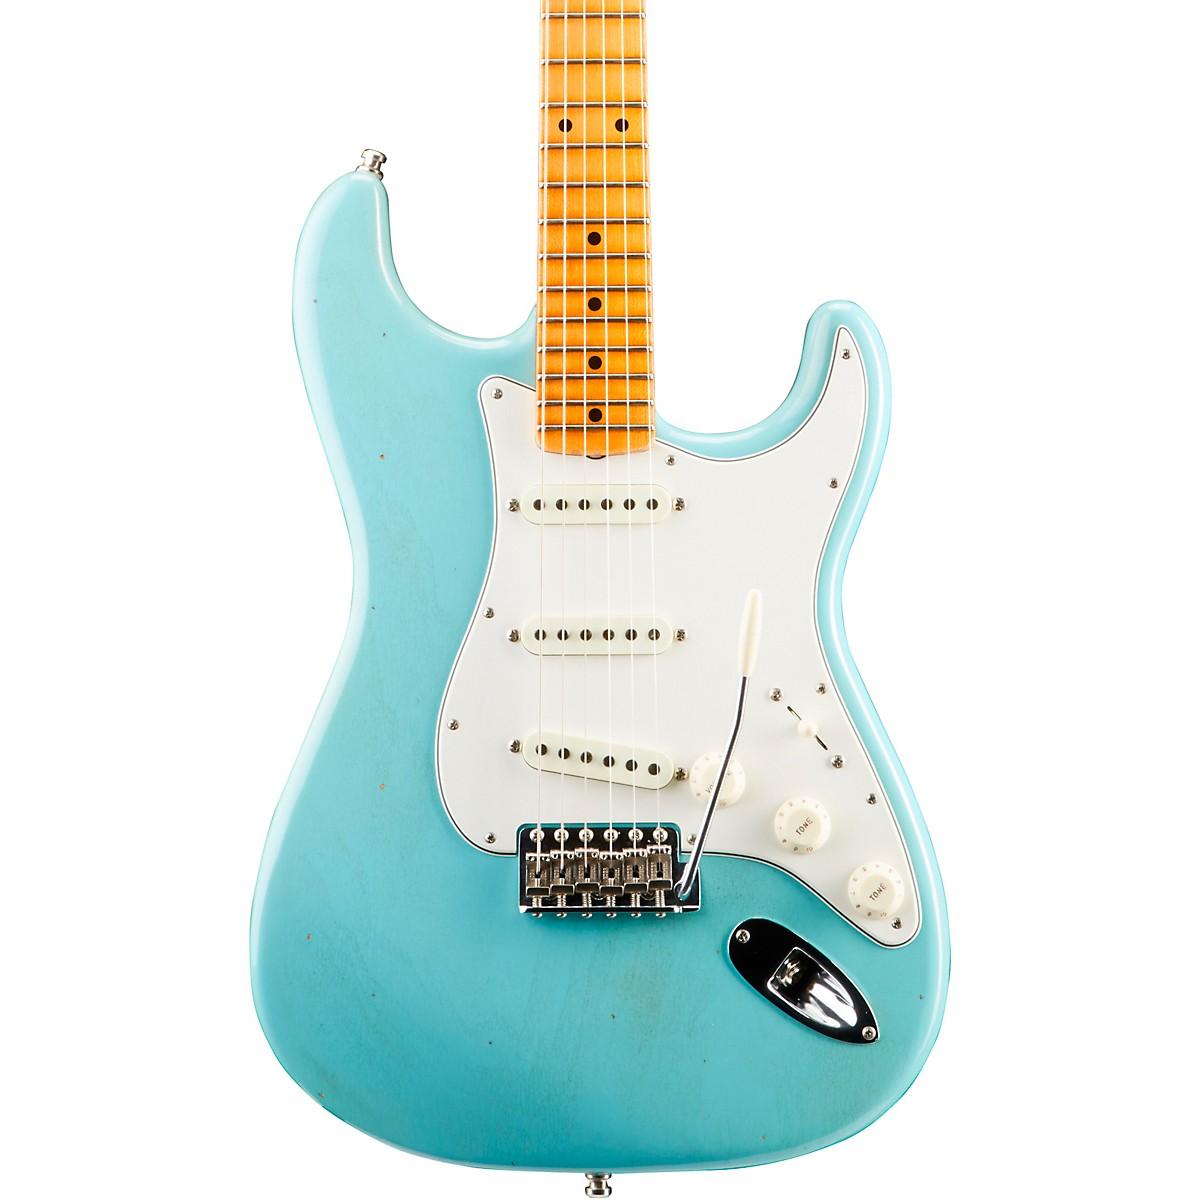 Fender Custom Shop Postmodern Stratocaster Journeyman Relic Electric Guitar